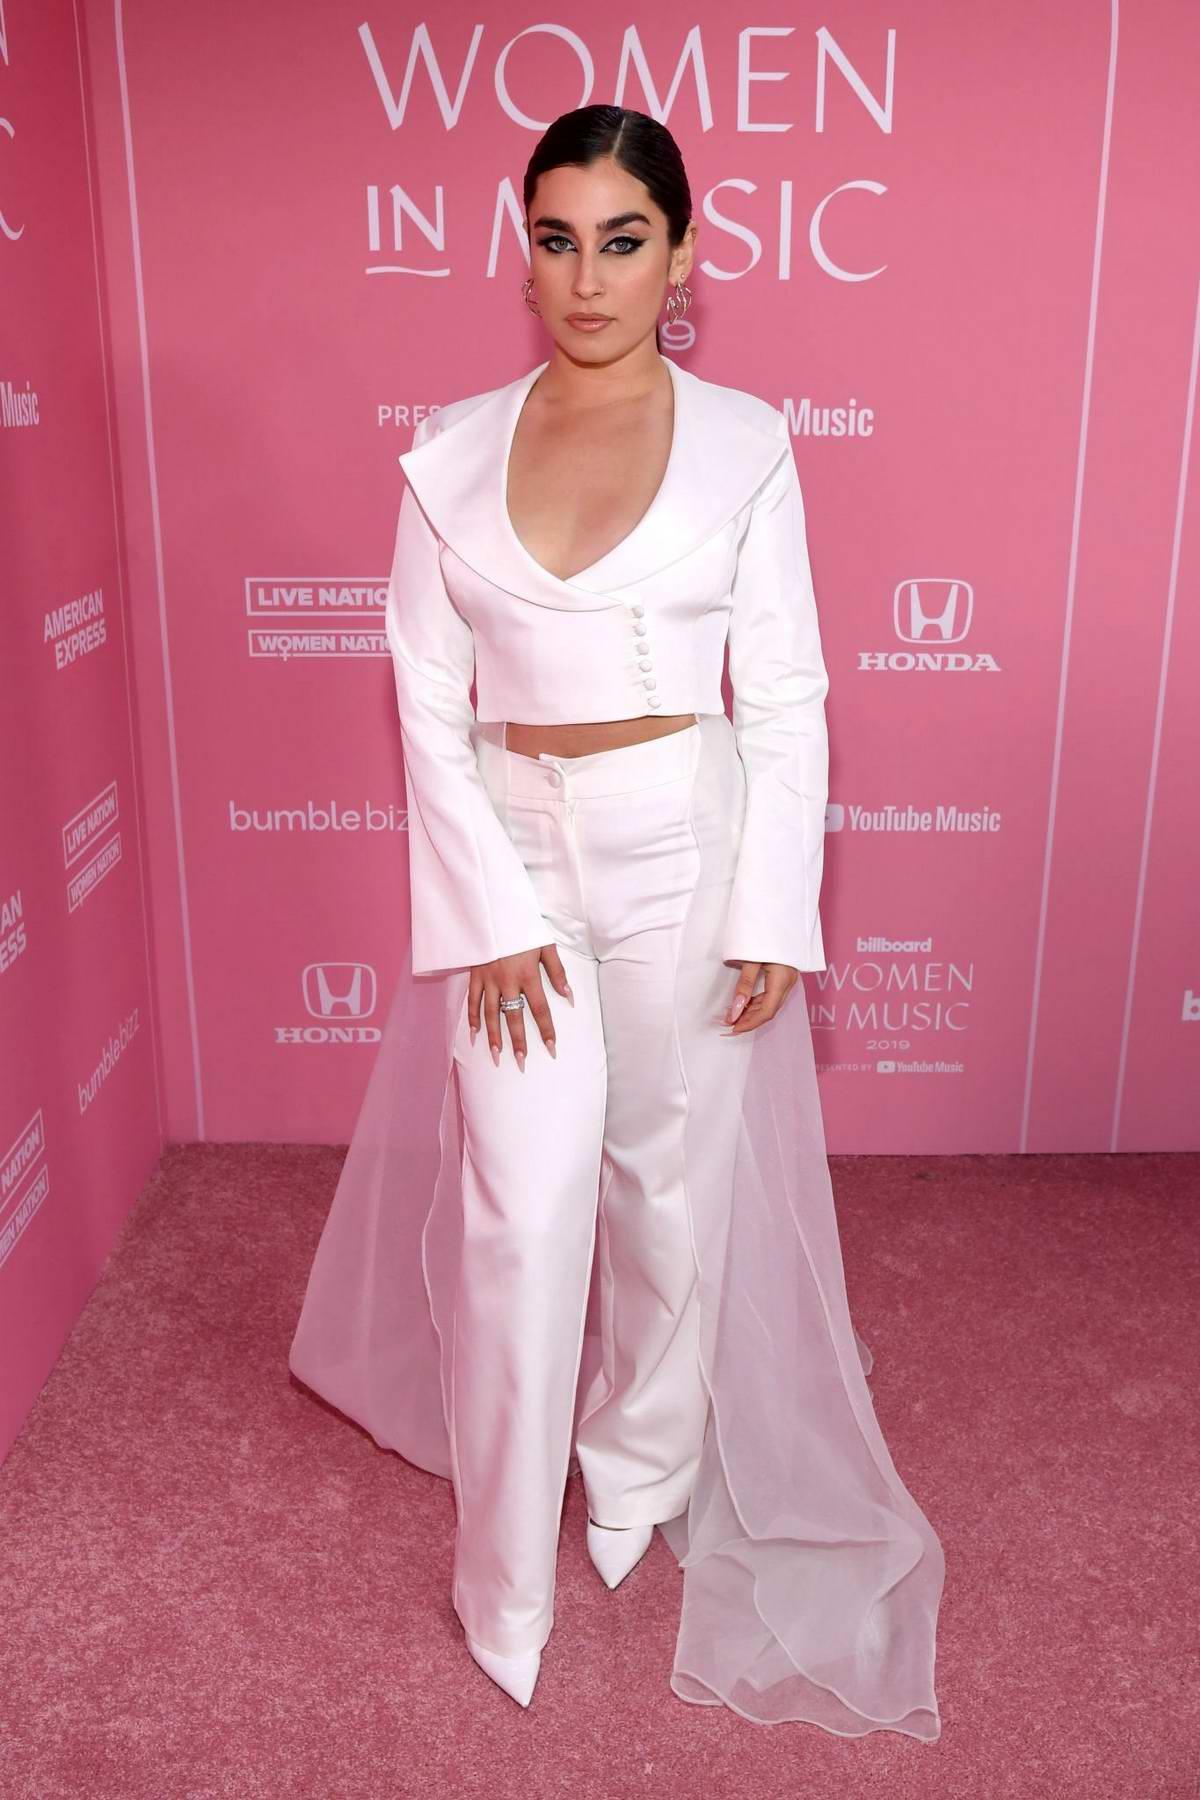 Lauren Jauregui attends the 2019 Billboard Women in Music at Hollywood Palladium in Los Angeles